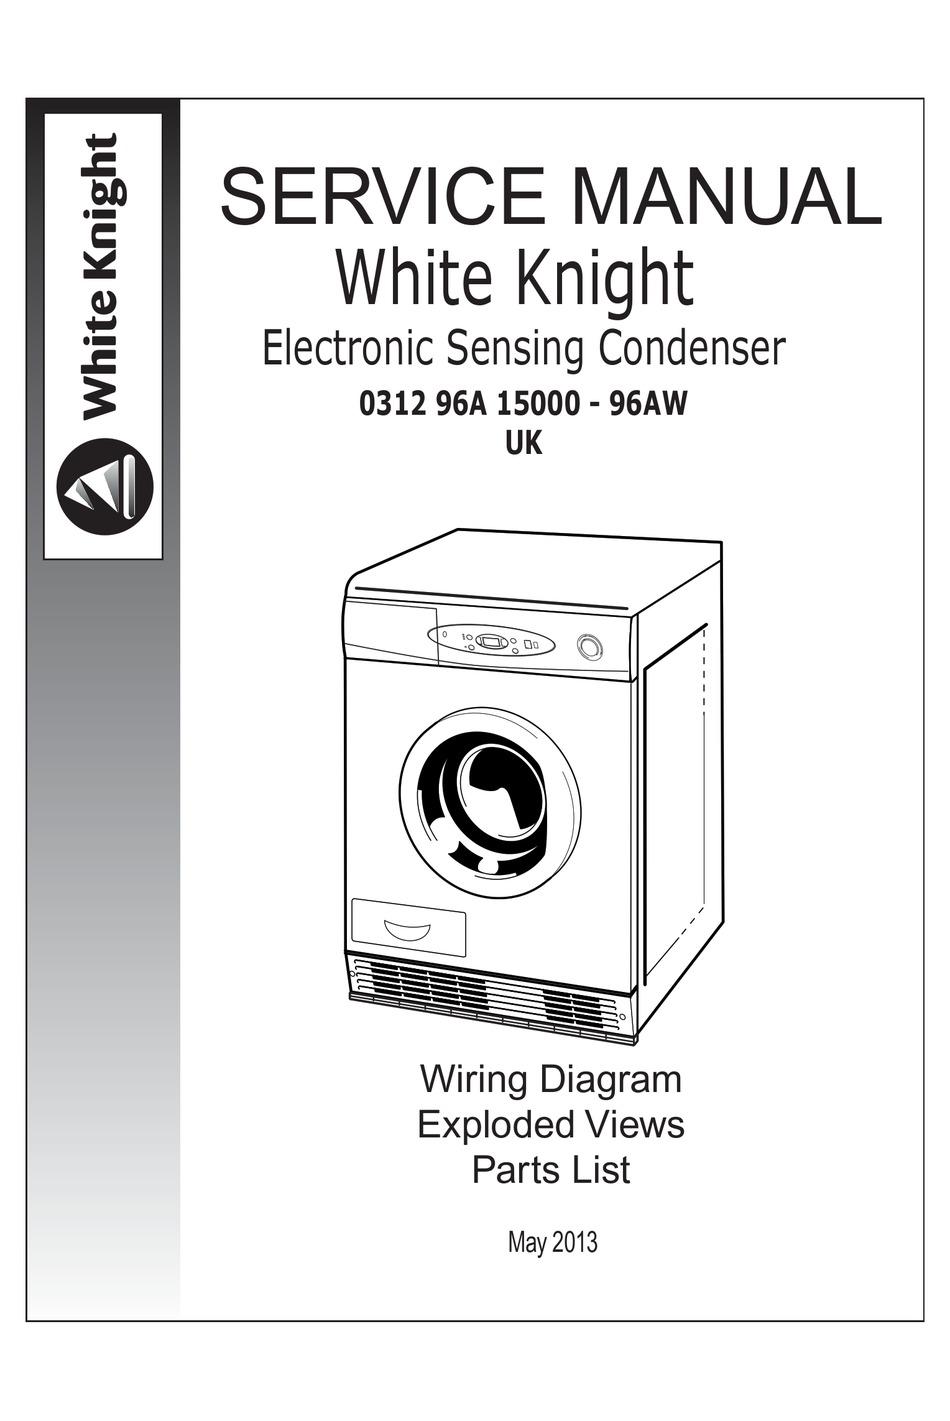 WHITE KNIGHT 96AW SERVICE MANUAL Pdf Download | ManualsLib | White Knight Tumble Dryer Wiring Diagram |  | ManualsLib